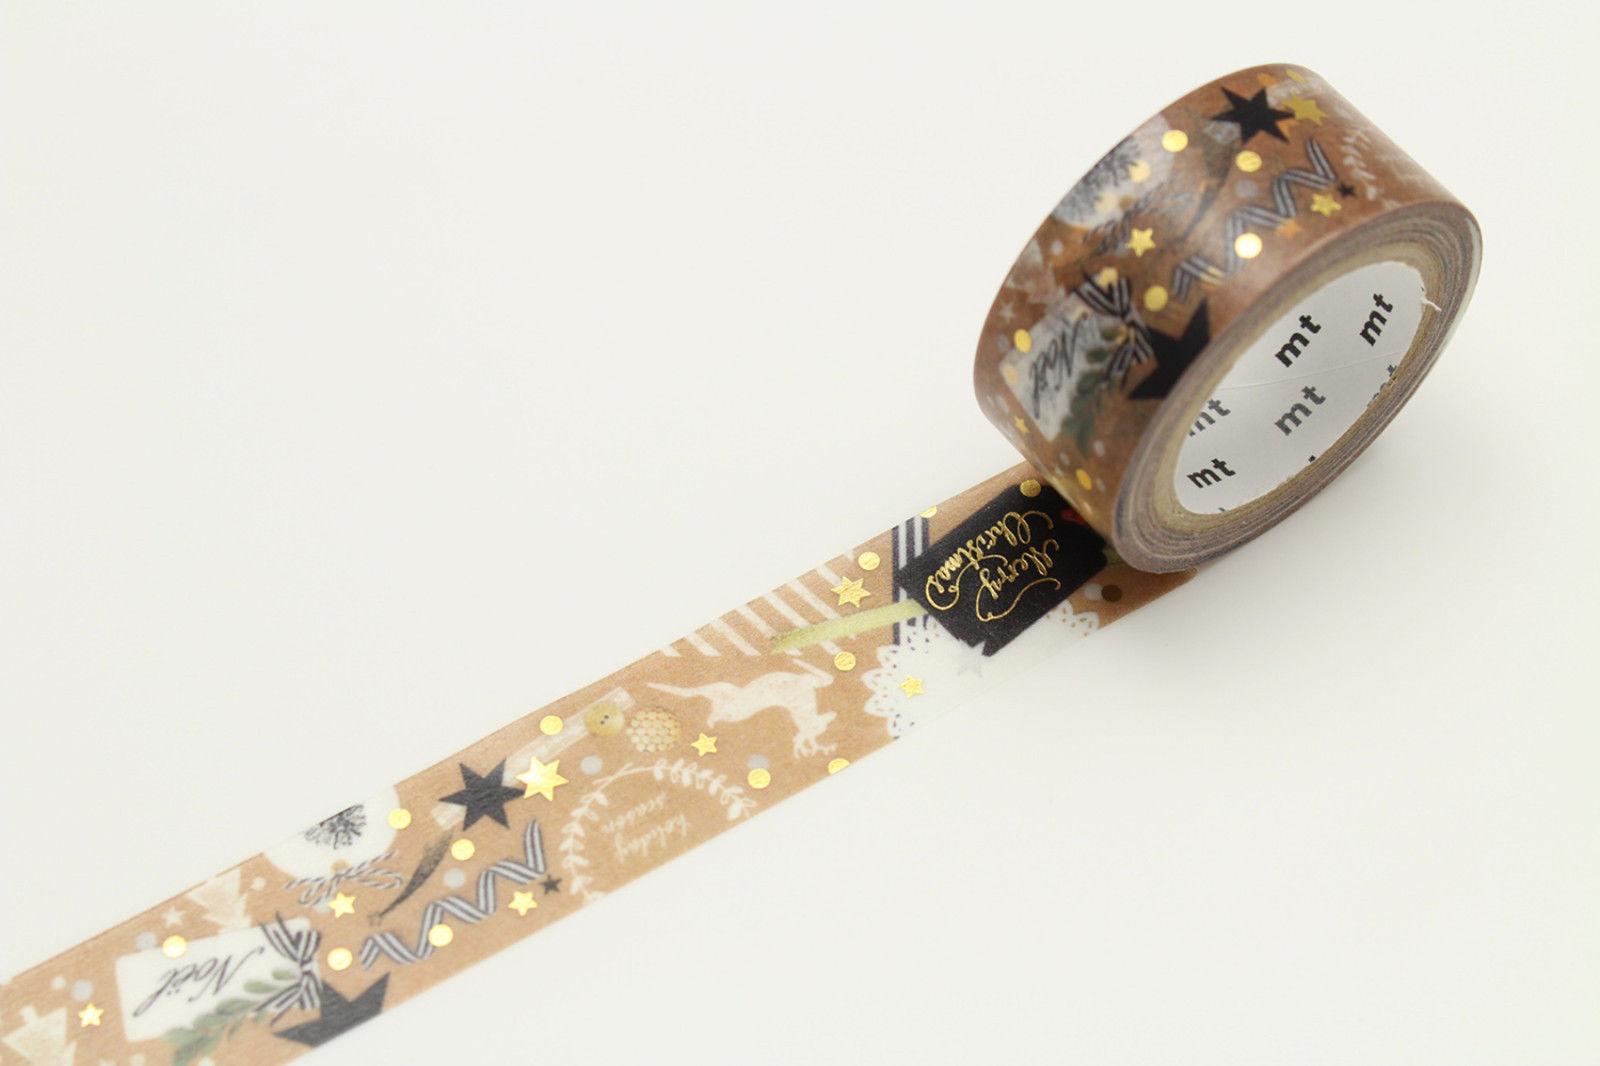 Variation-of-Original-MT-Japanese-Christmas-Washi-Masking-Tape-Roll-Deco-Sticky-Gift-Tape-152336733447-3fa2